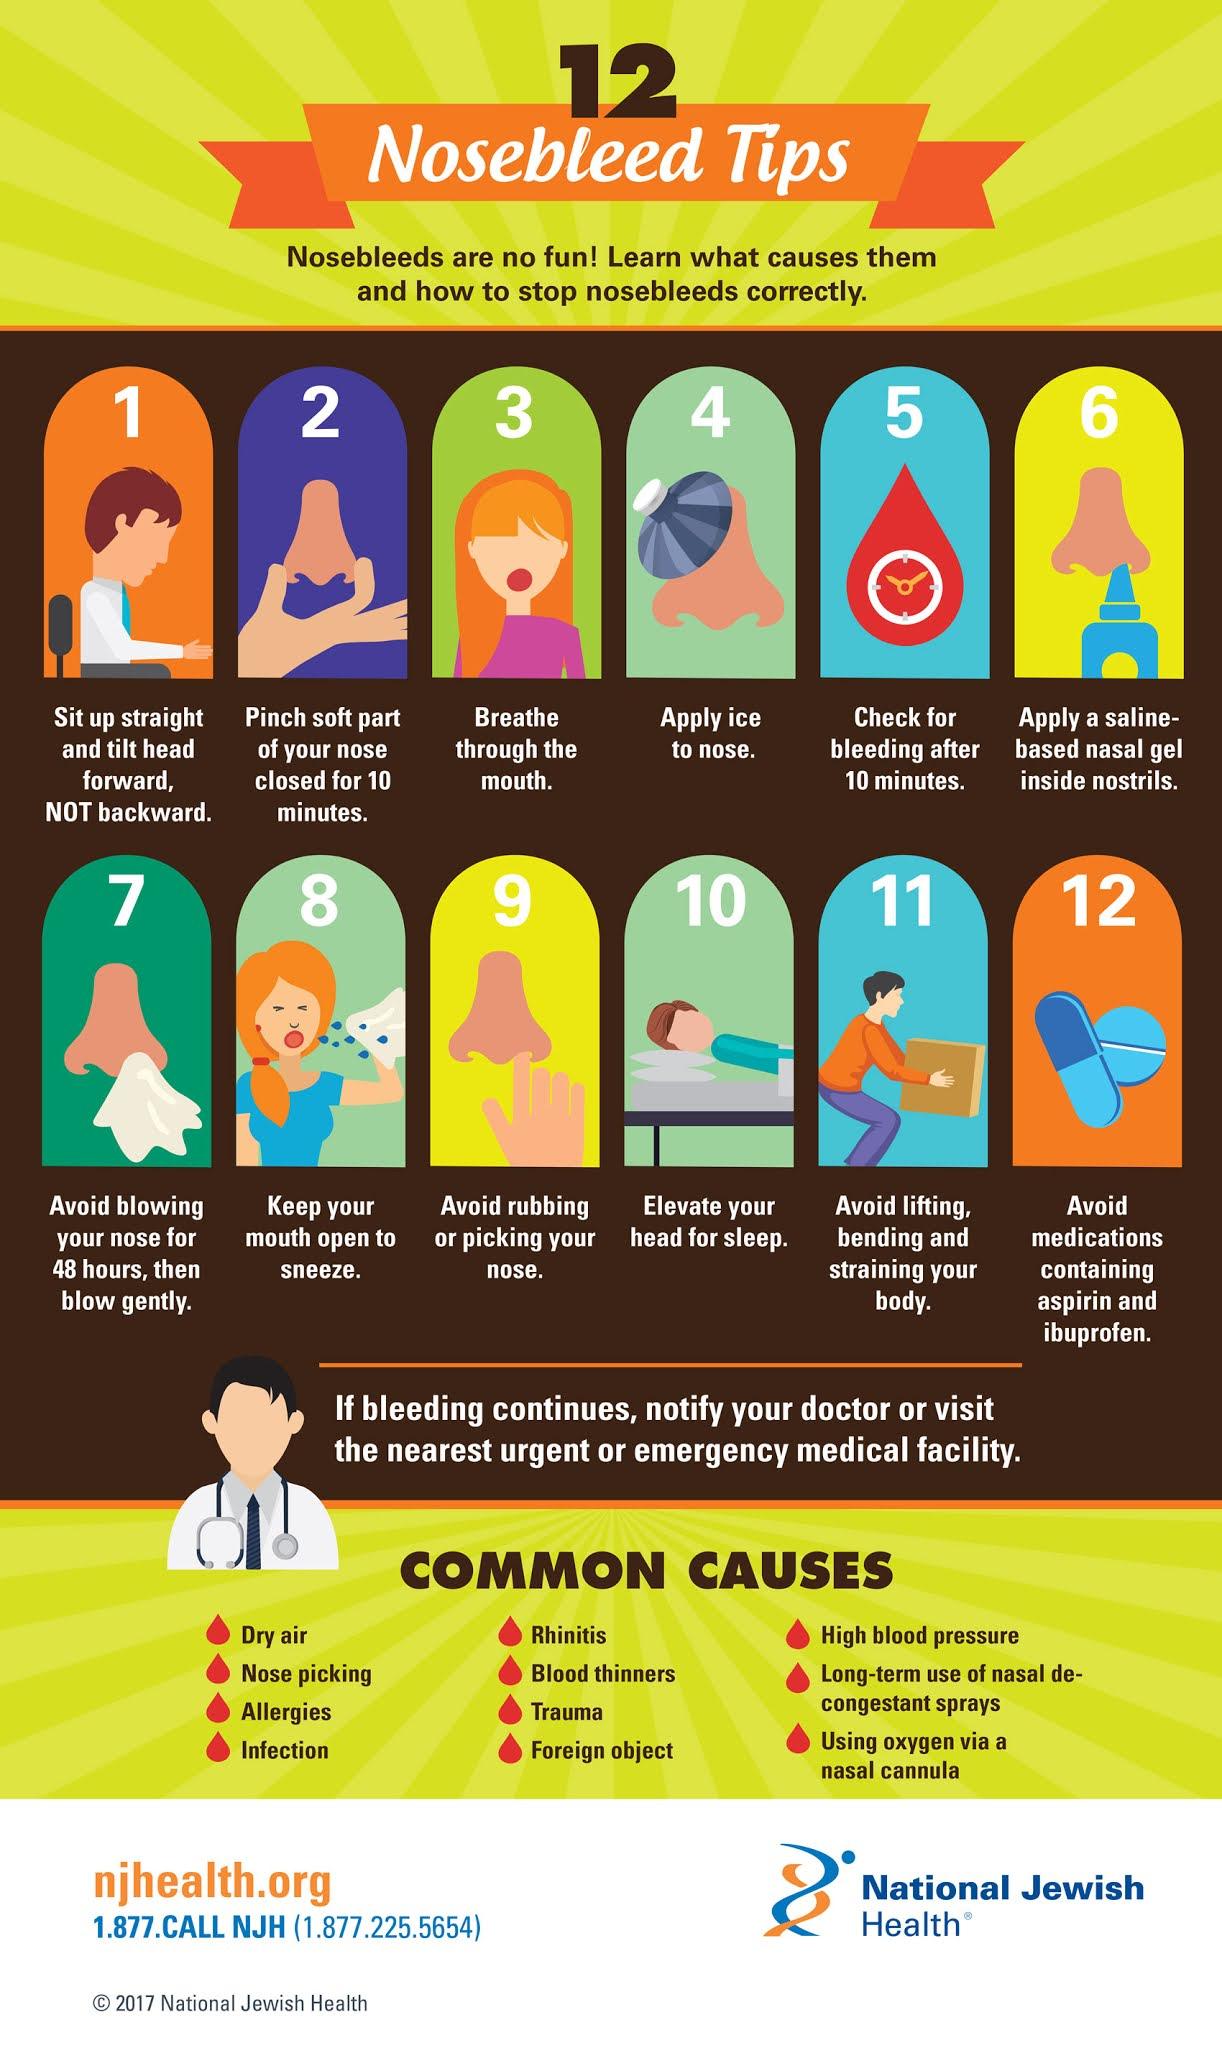 12 Nosebleed Tips #infographic #Health #Nosebleed Tips #infographics